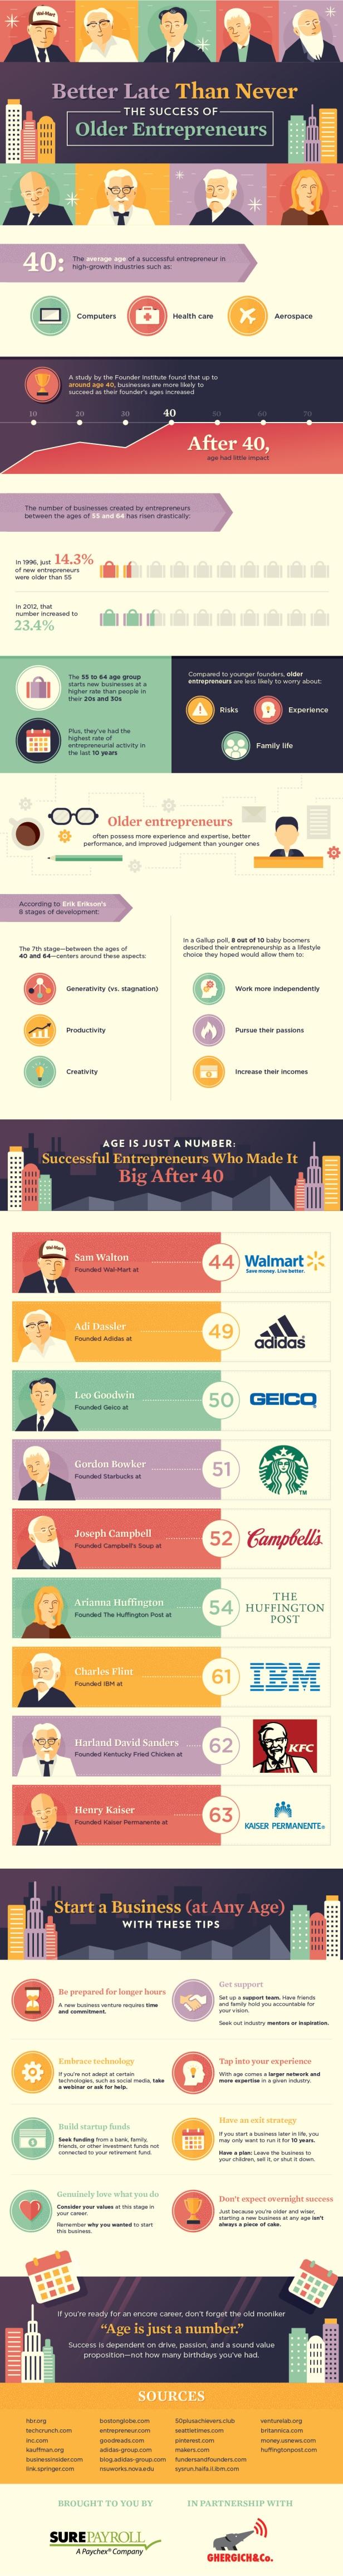 20151103081719-success-of-older-entrepreneurs-infographic